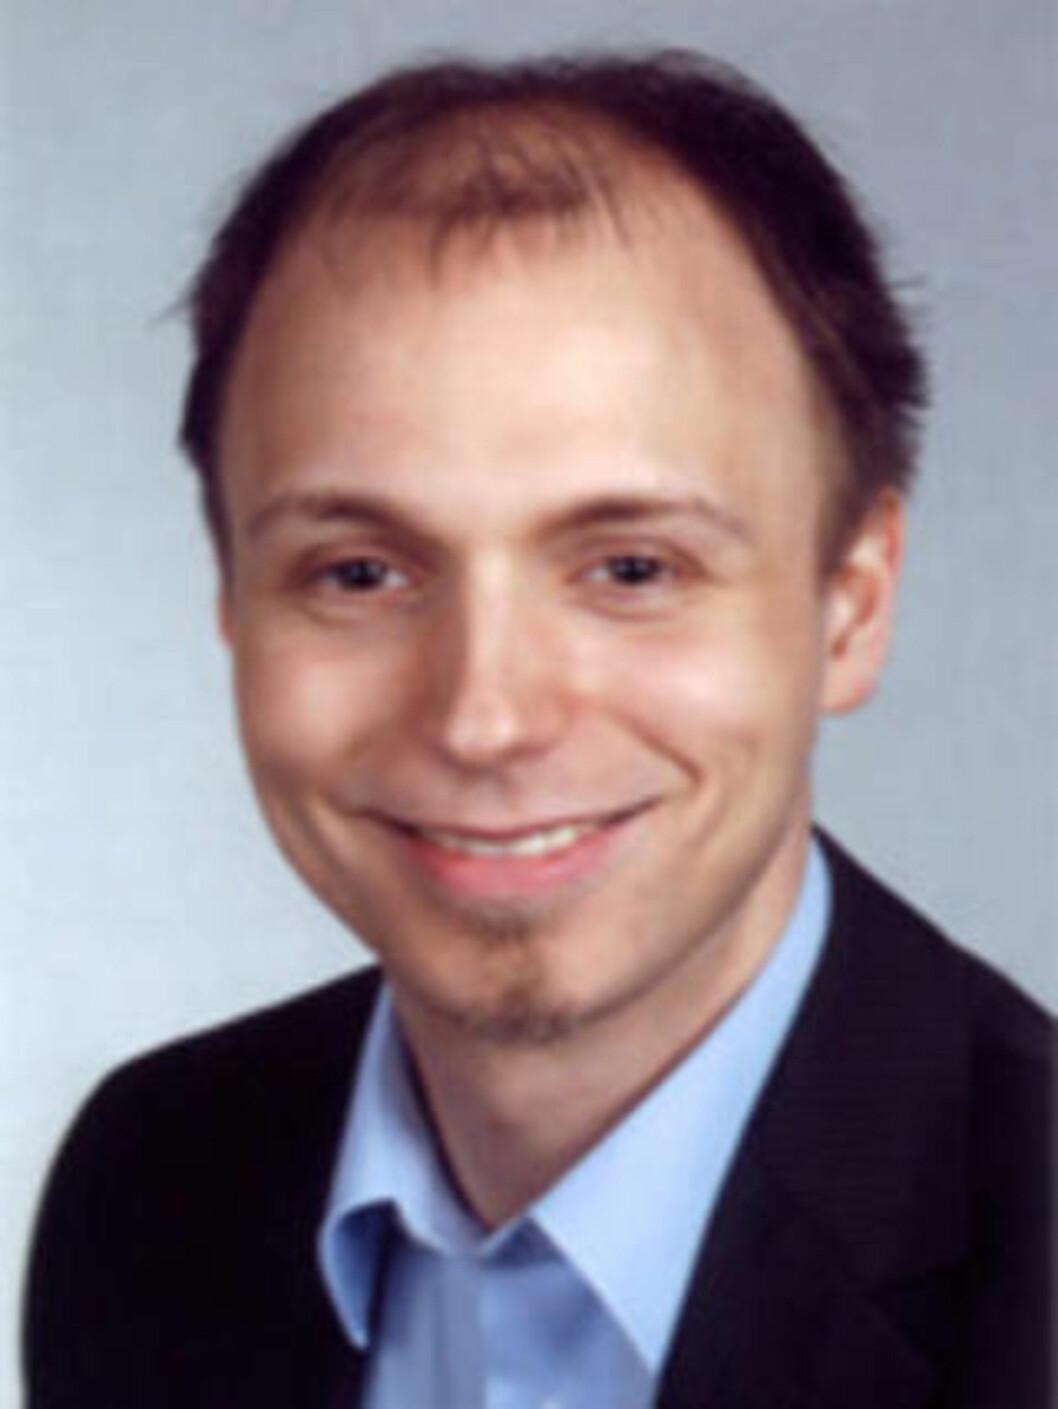 <strong>VILLE BARE BIDRA:</strong> Robin Seggelman. Foto: Linux Tag